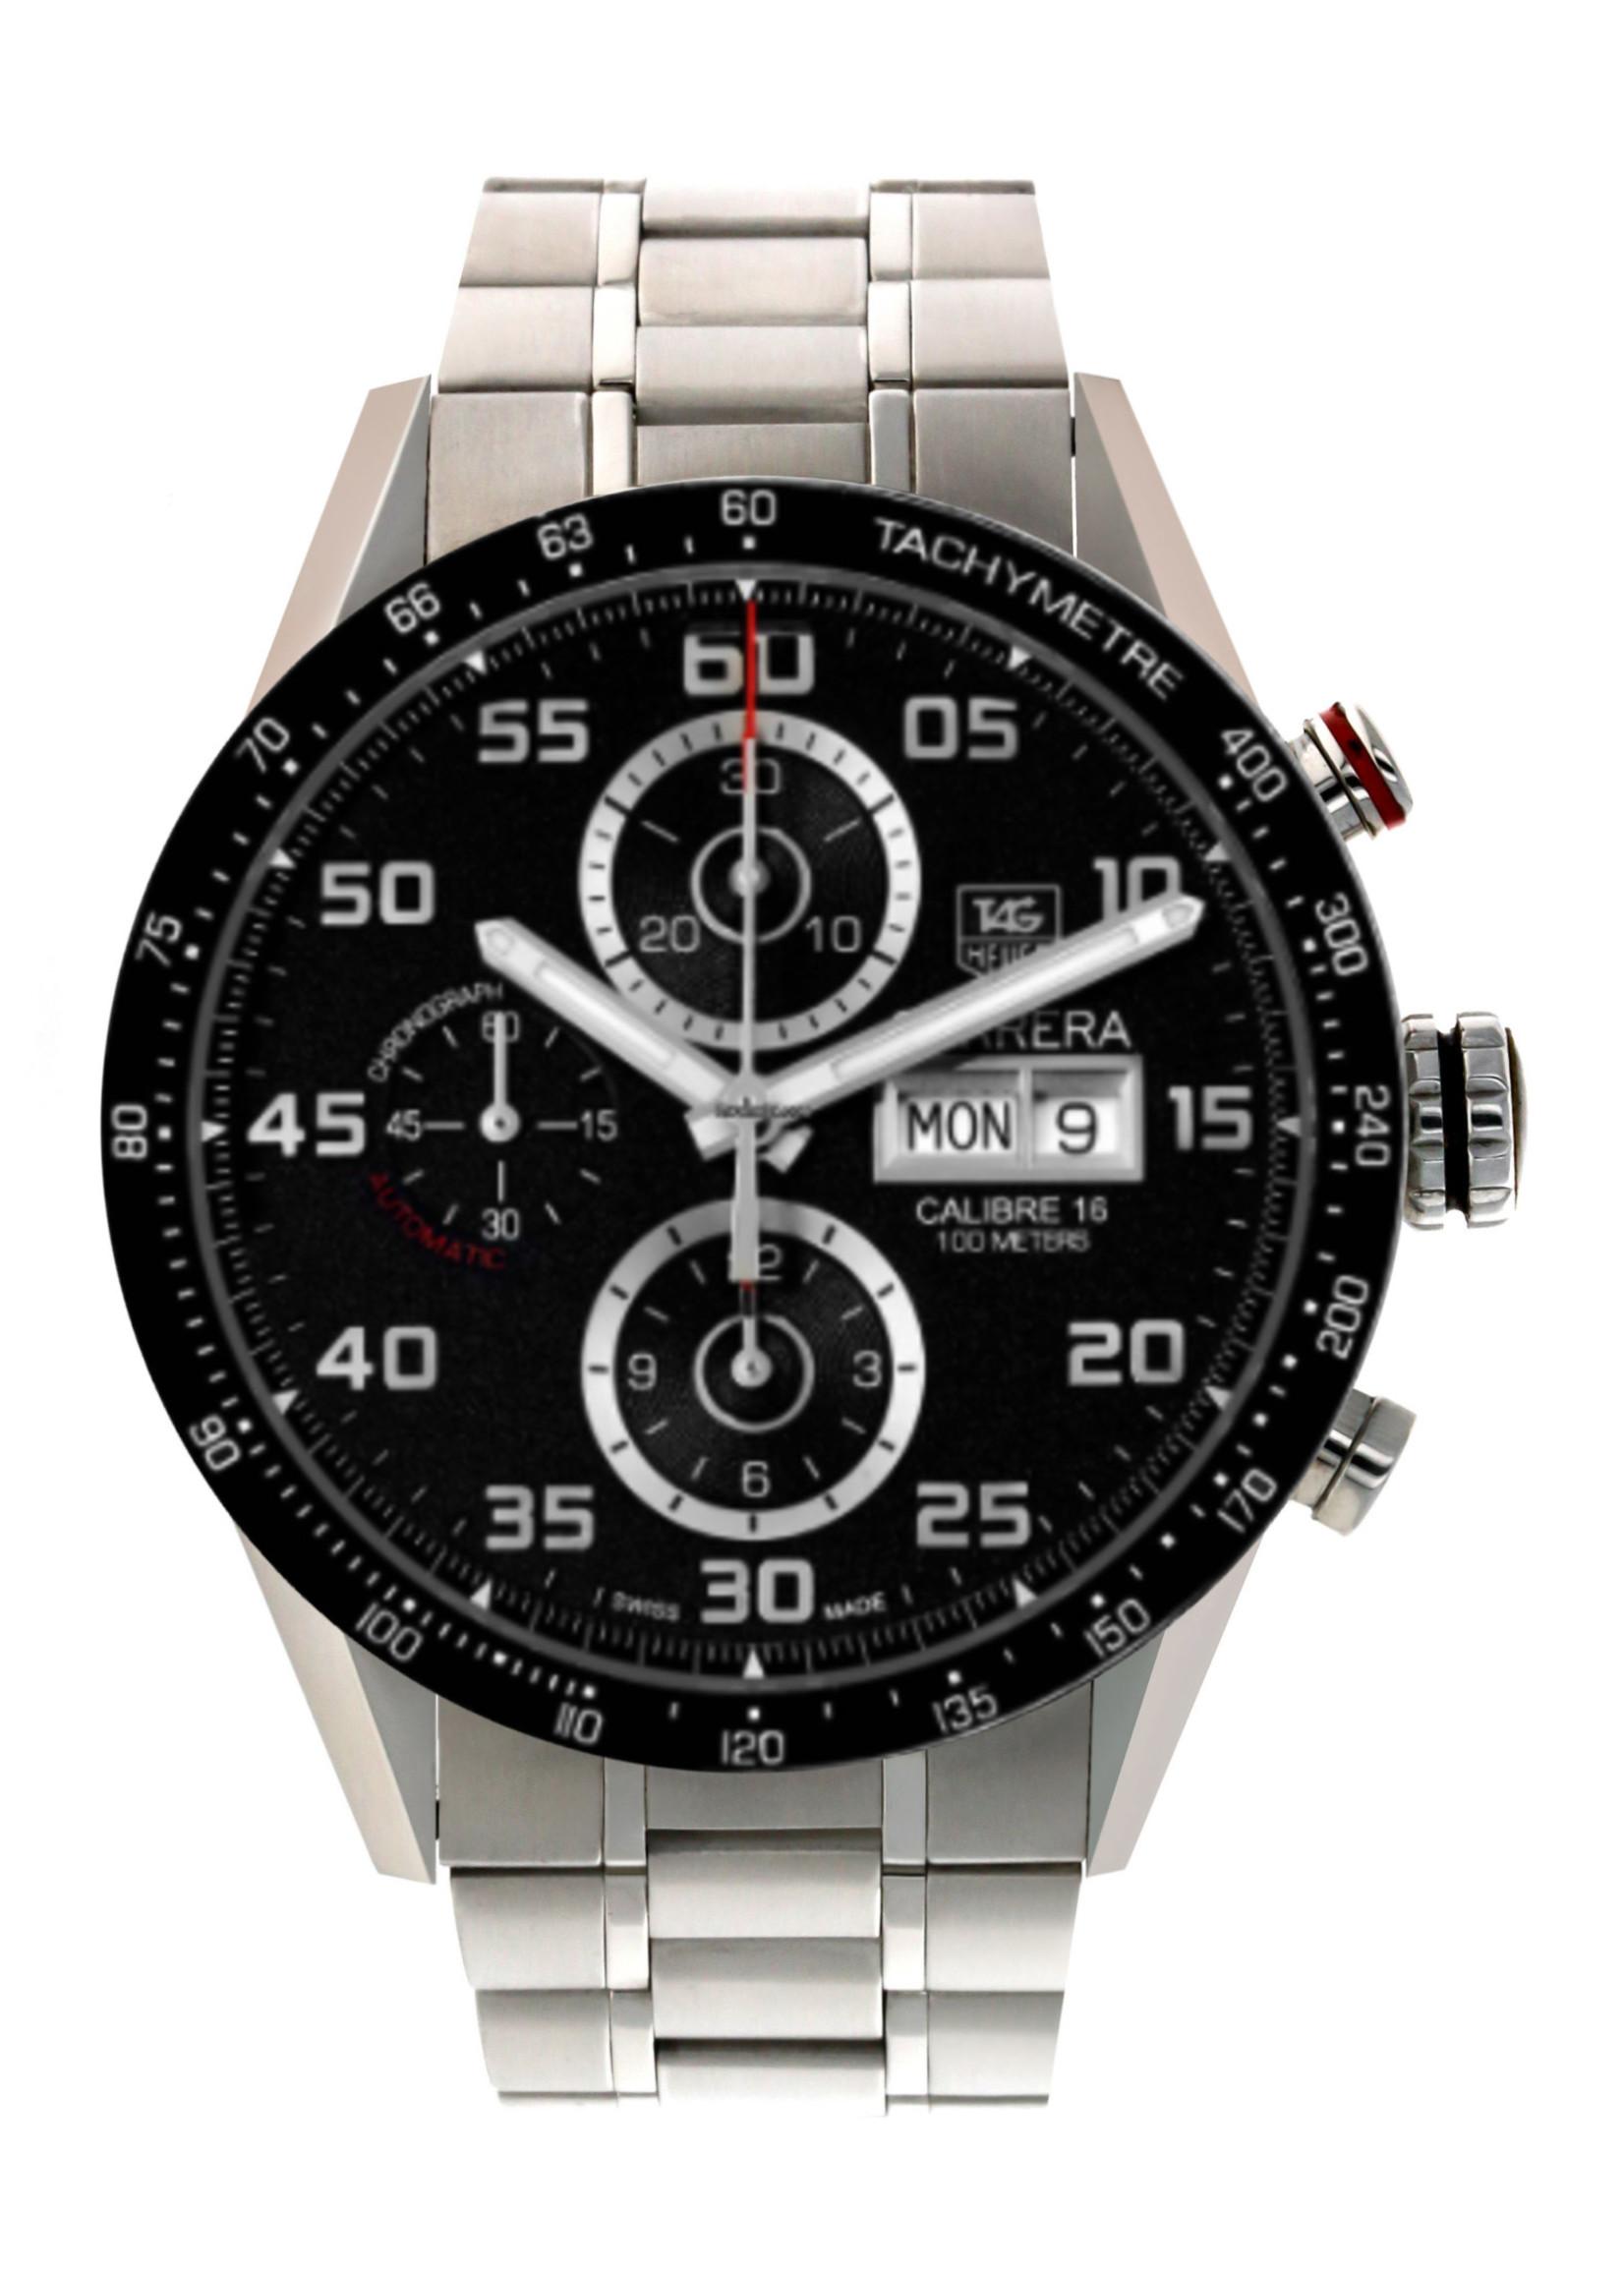 Tag Heuer Watches TAG HEUER CARRERA 43MM (2013 B+P) #CV2A1R.BA0799